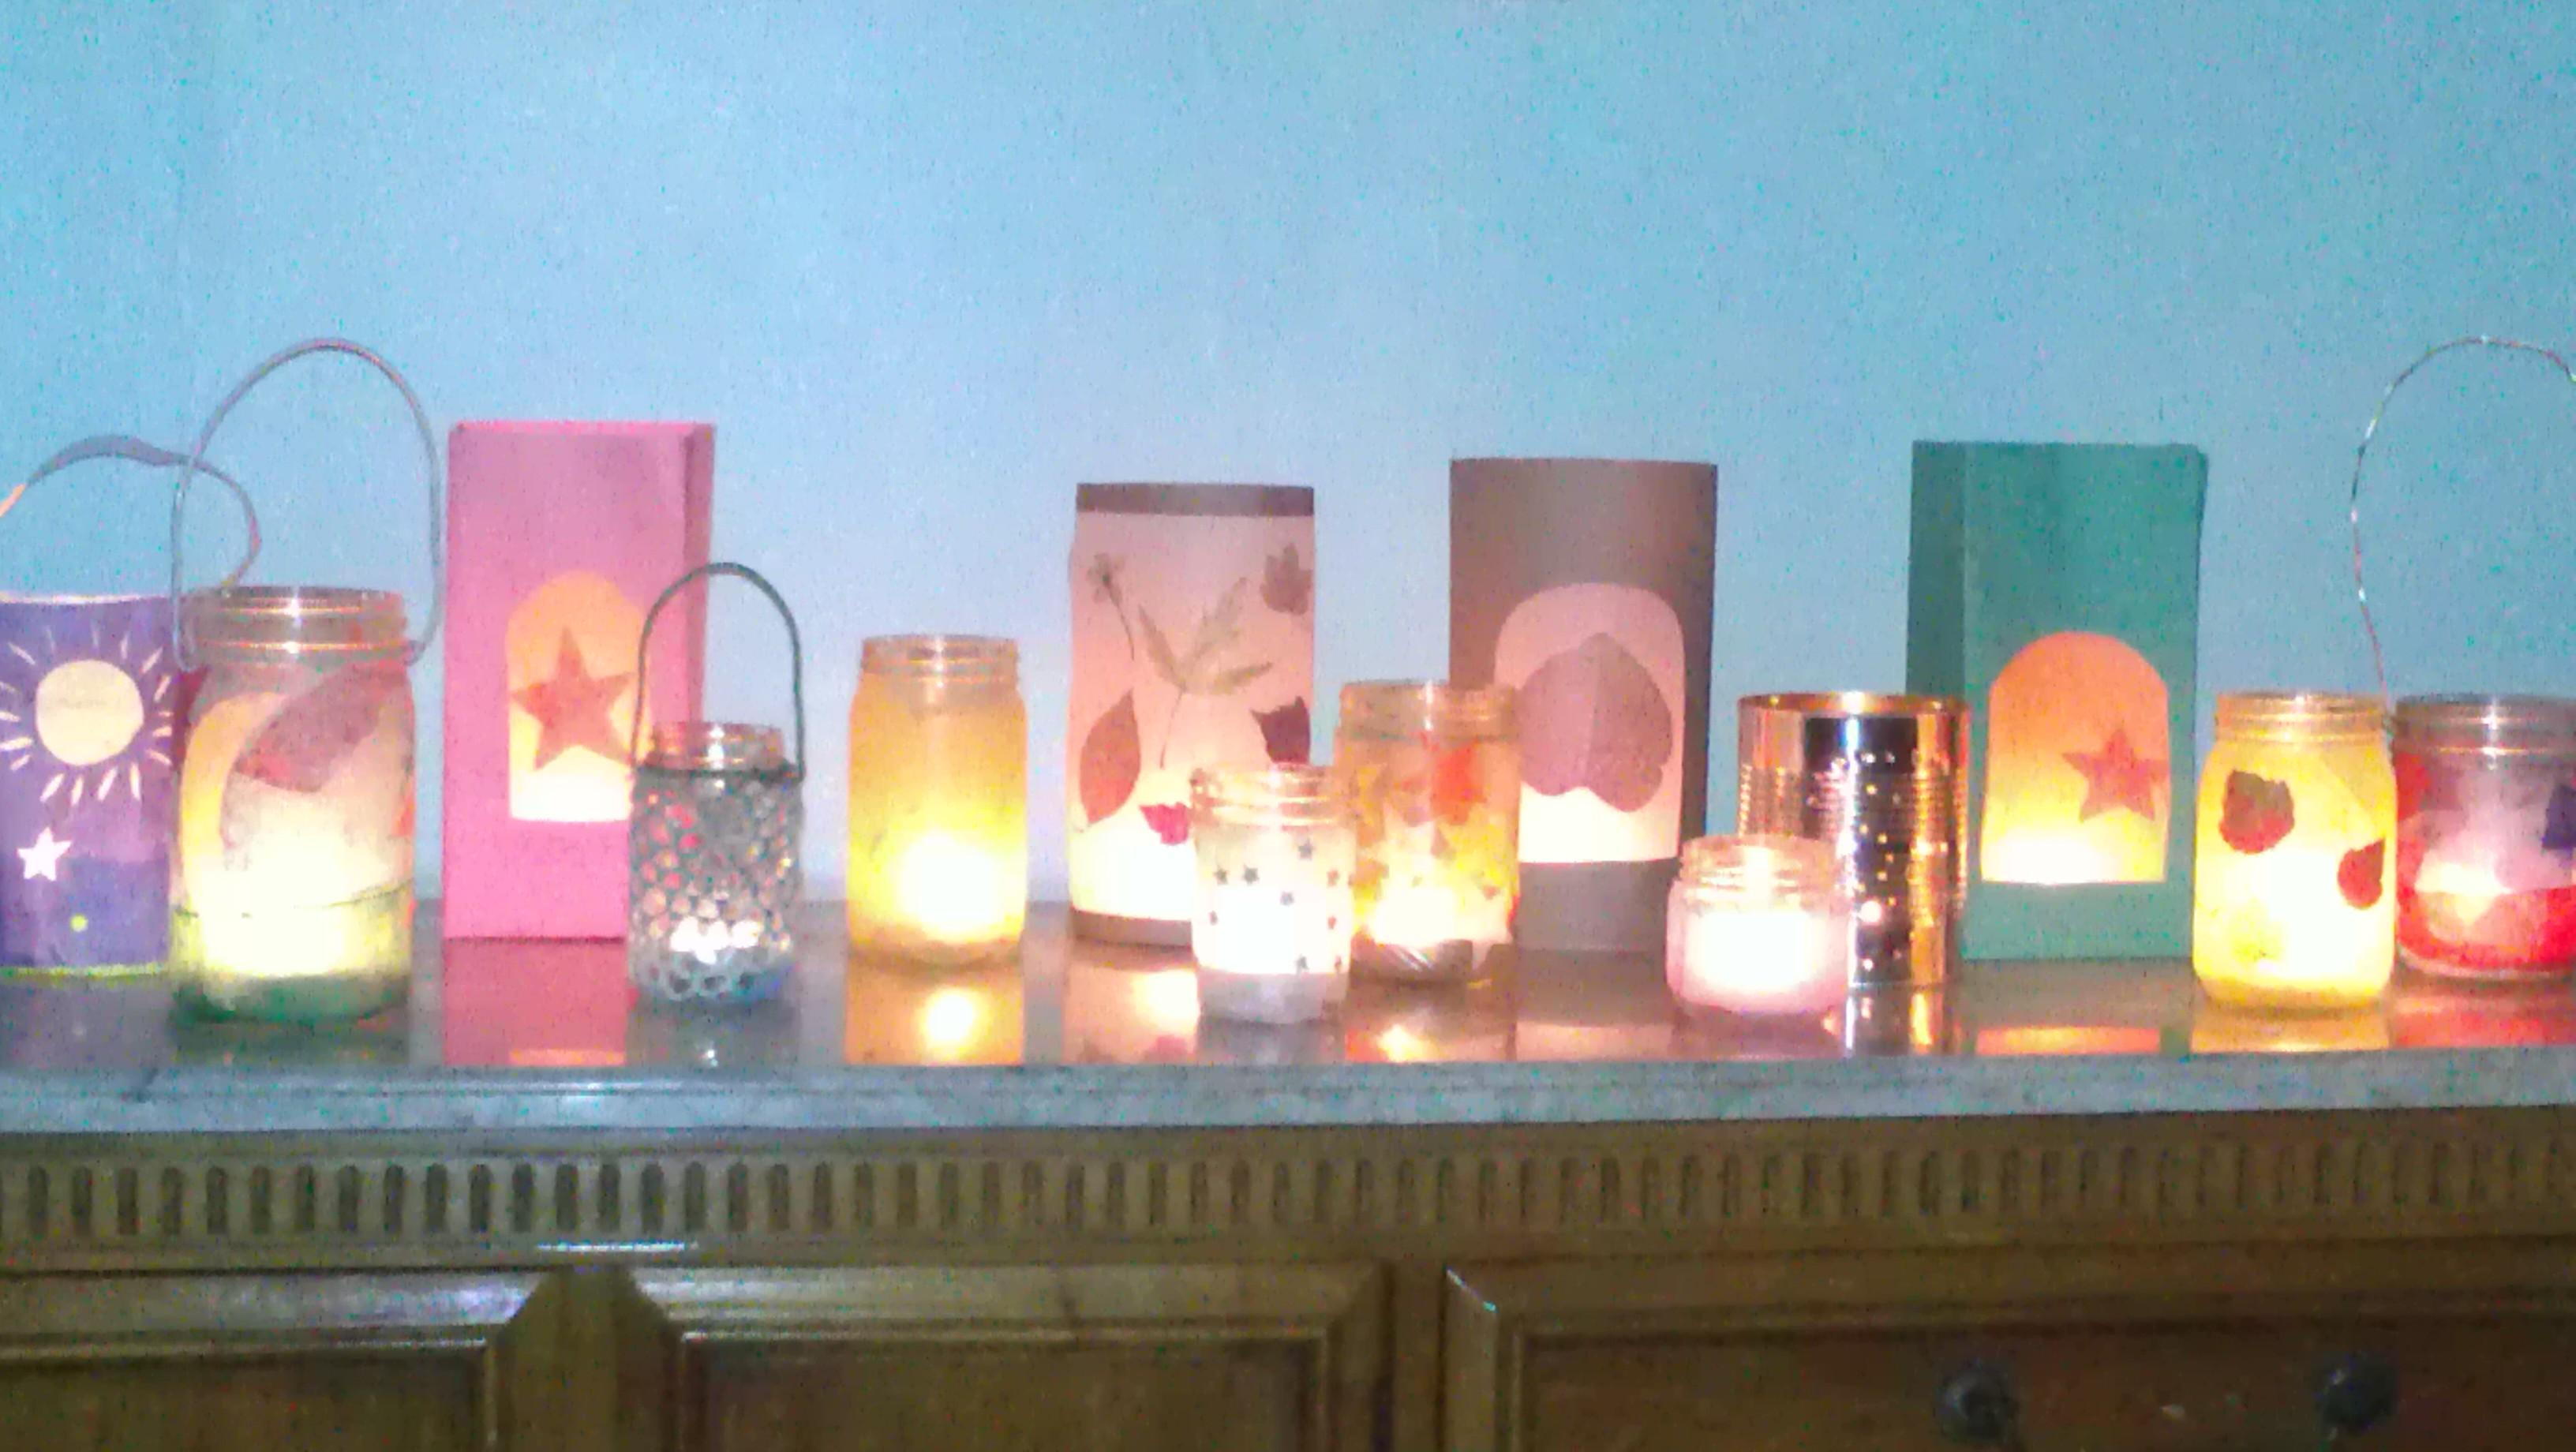 Glowing lanterns, all homemade.